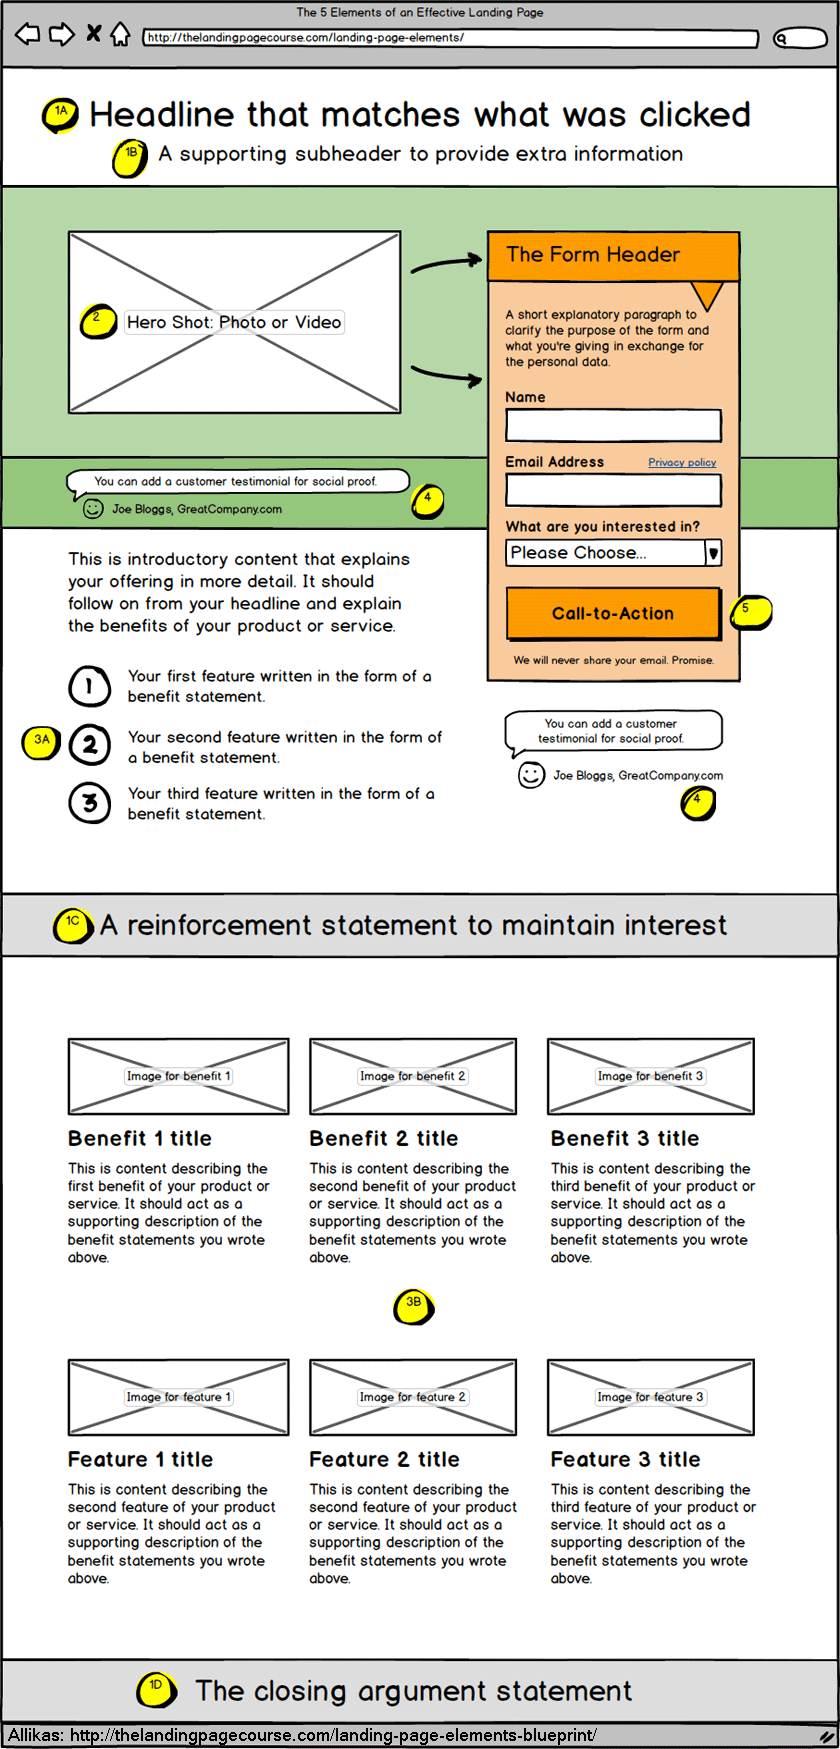 5_maandumislehe_elementi